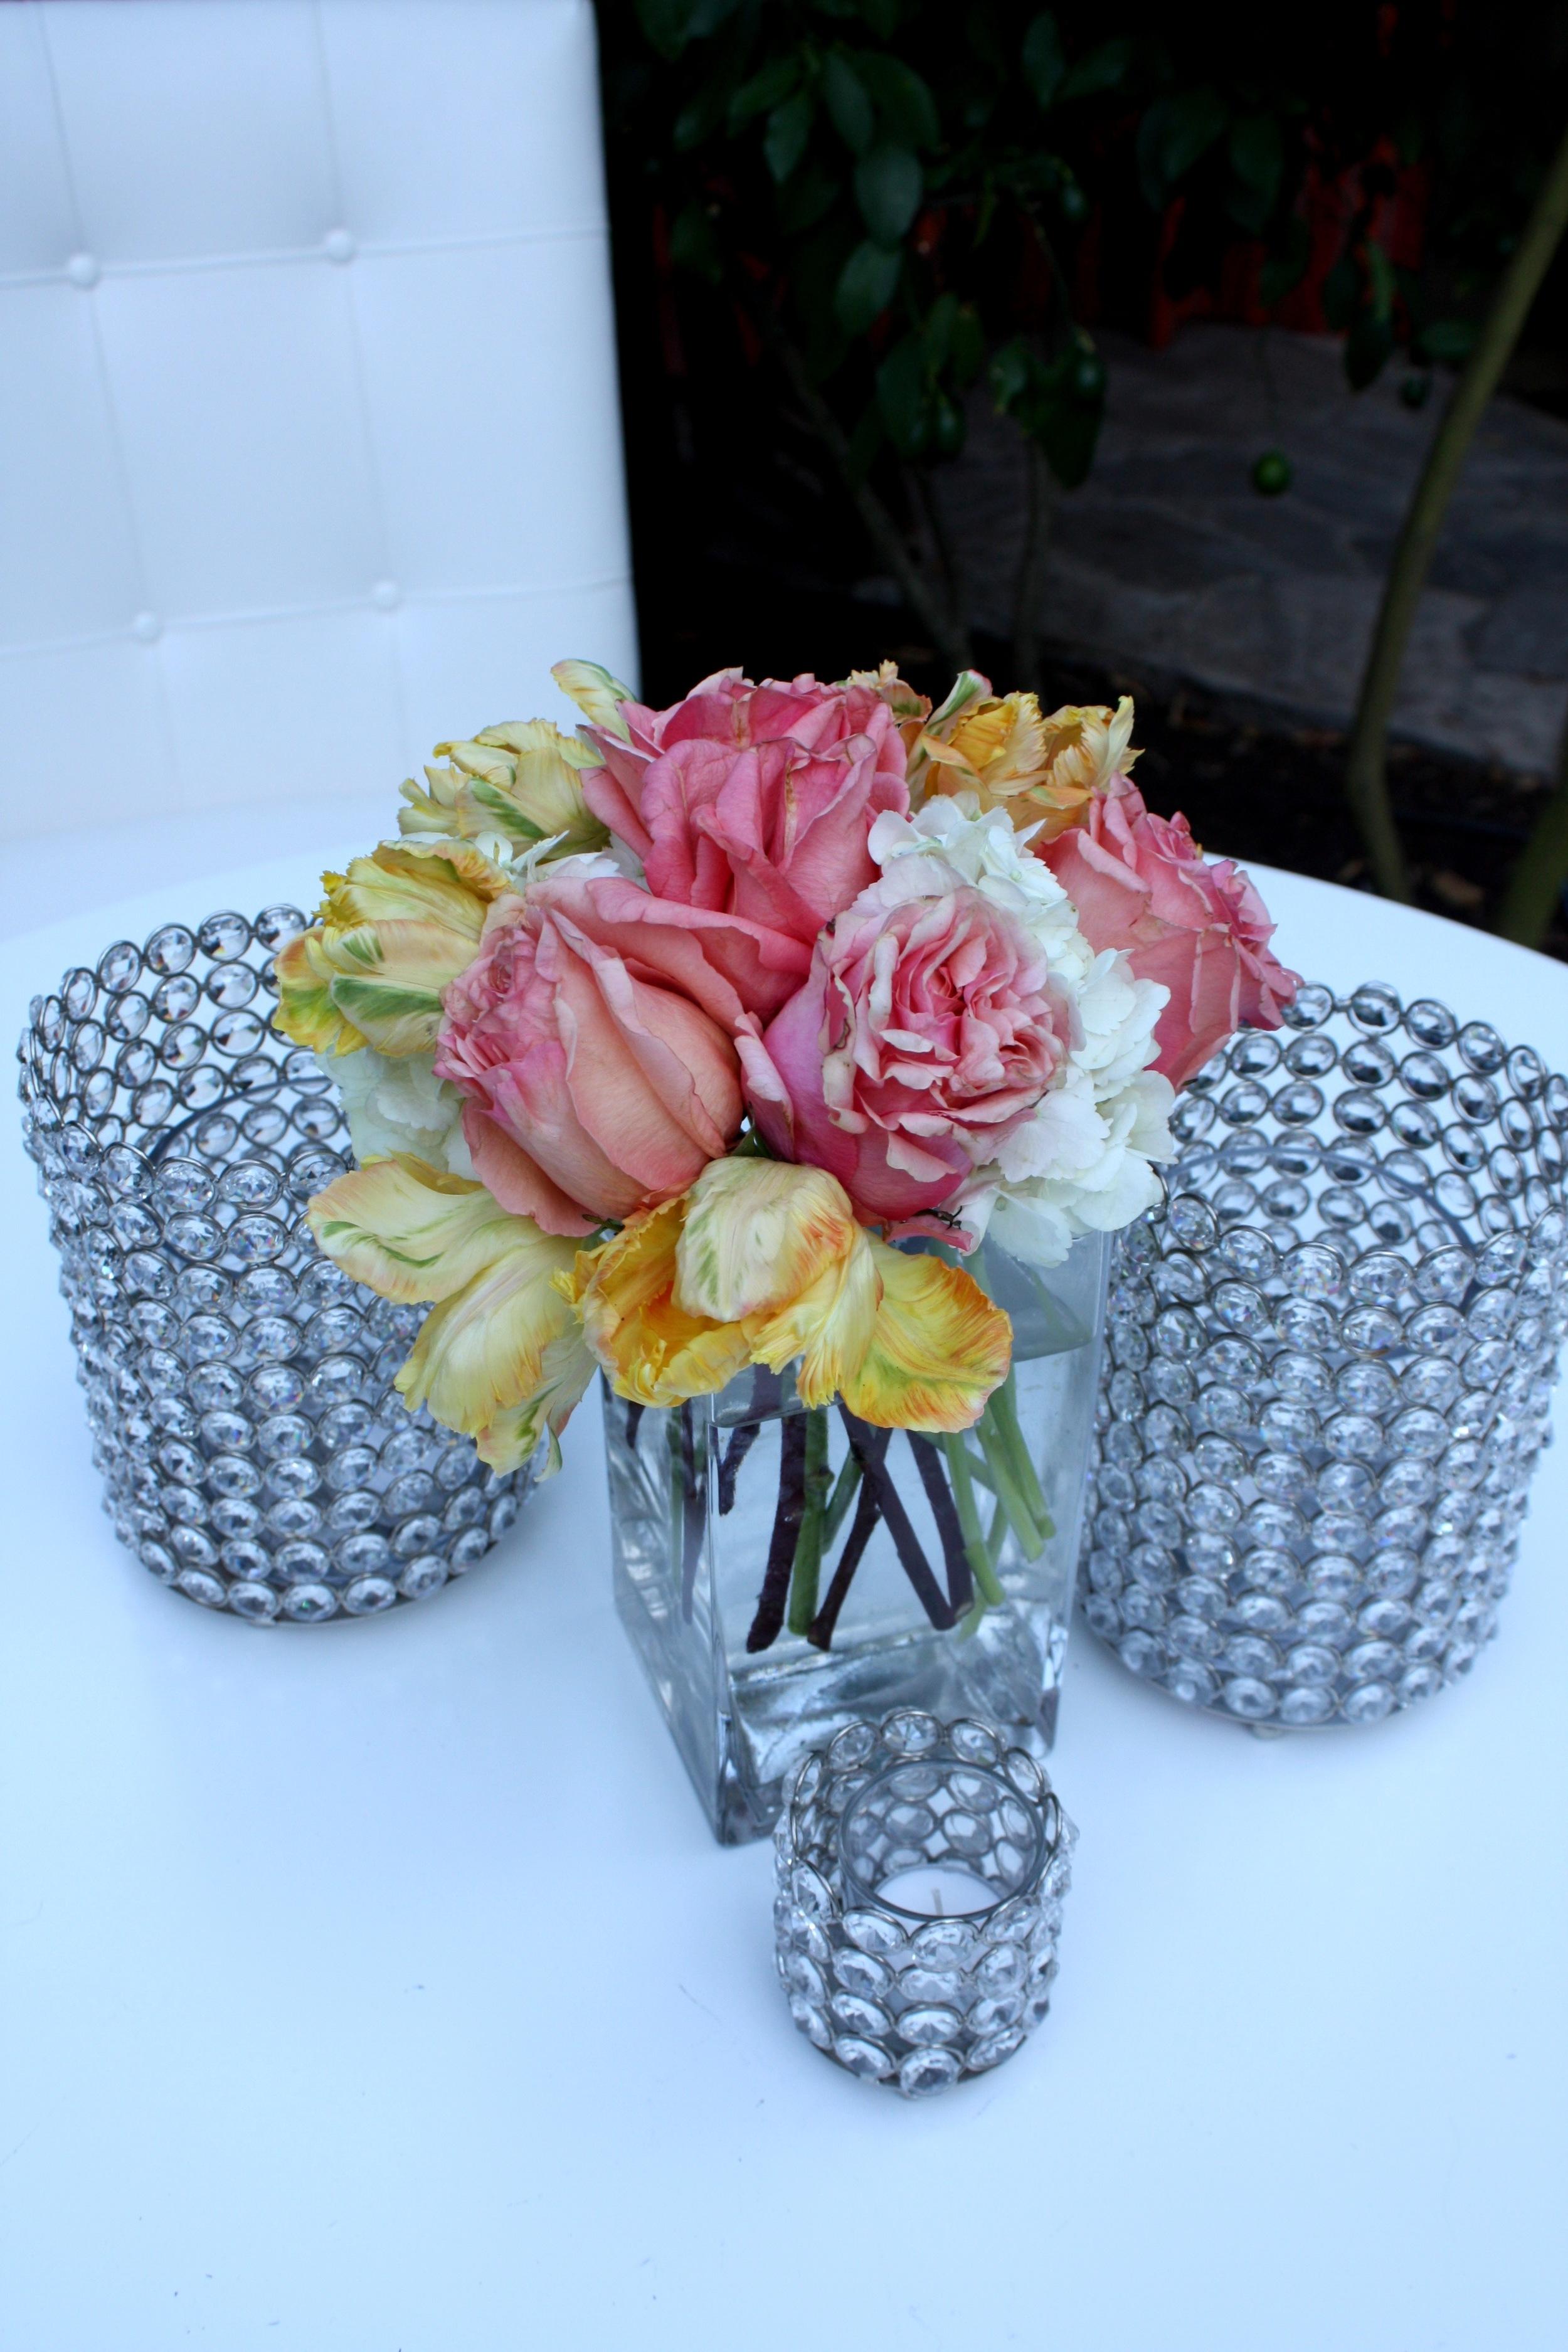 44.RS - crystal tea lightsm sparkle wedding, gorgeous wedding decor, peach + coral weddingm summer wedding, .jpg